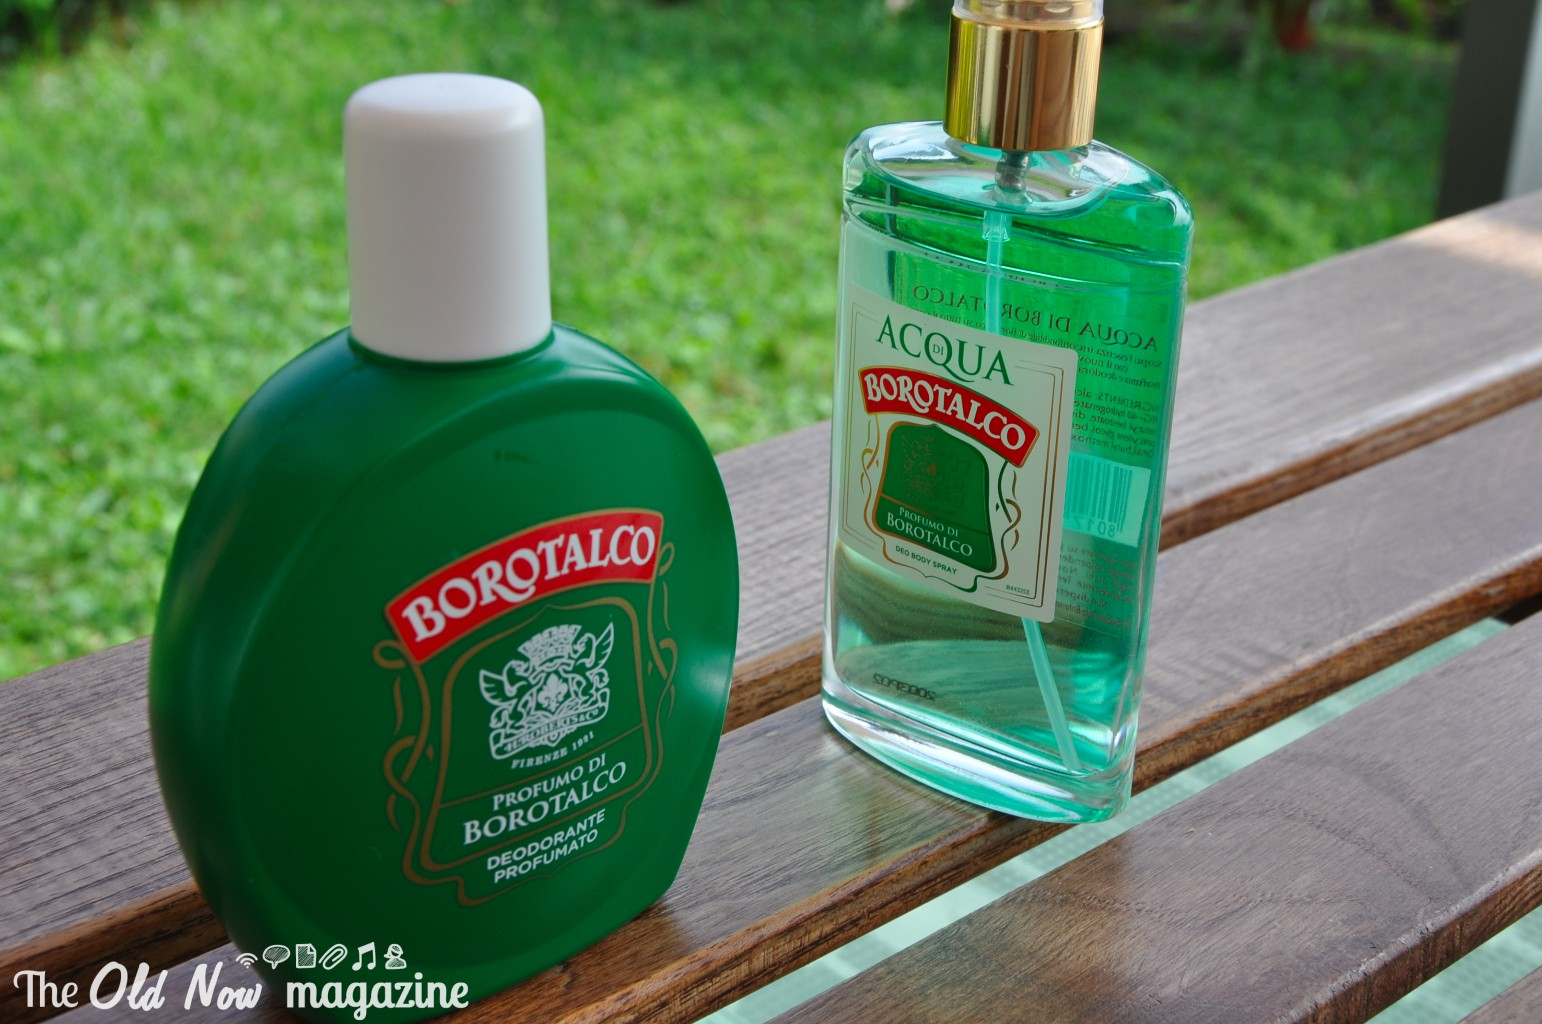 Borotalco review l 39 animo vintage - Borotalco bagno ...